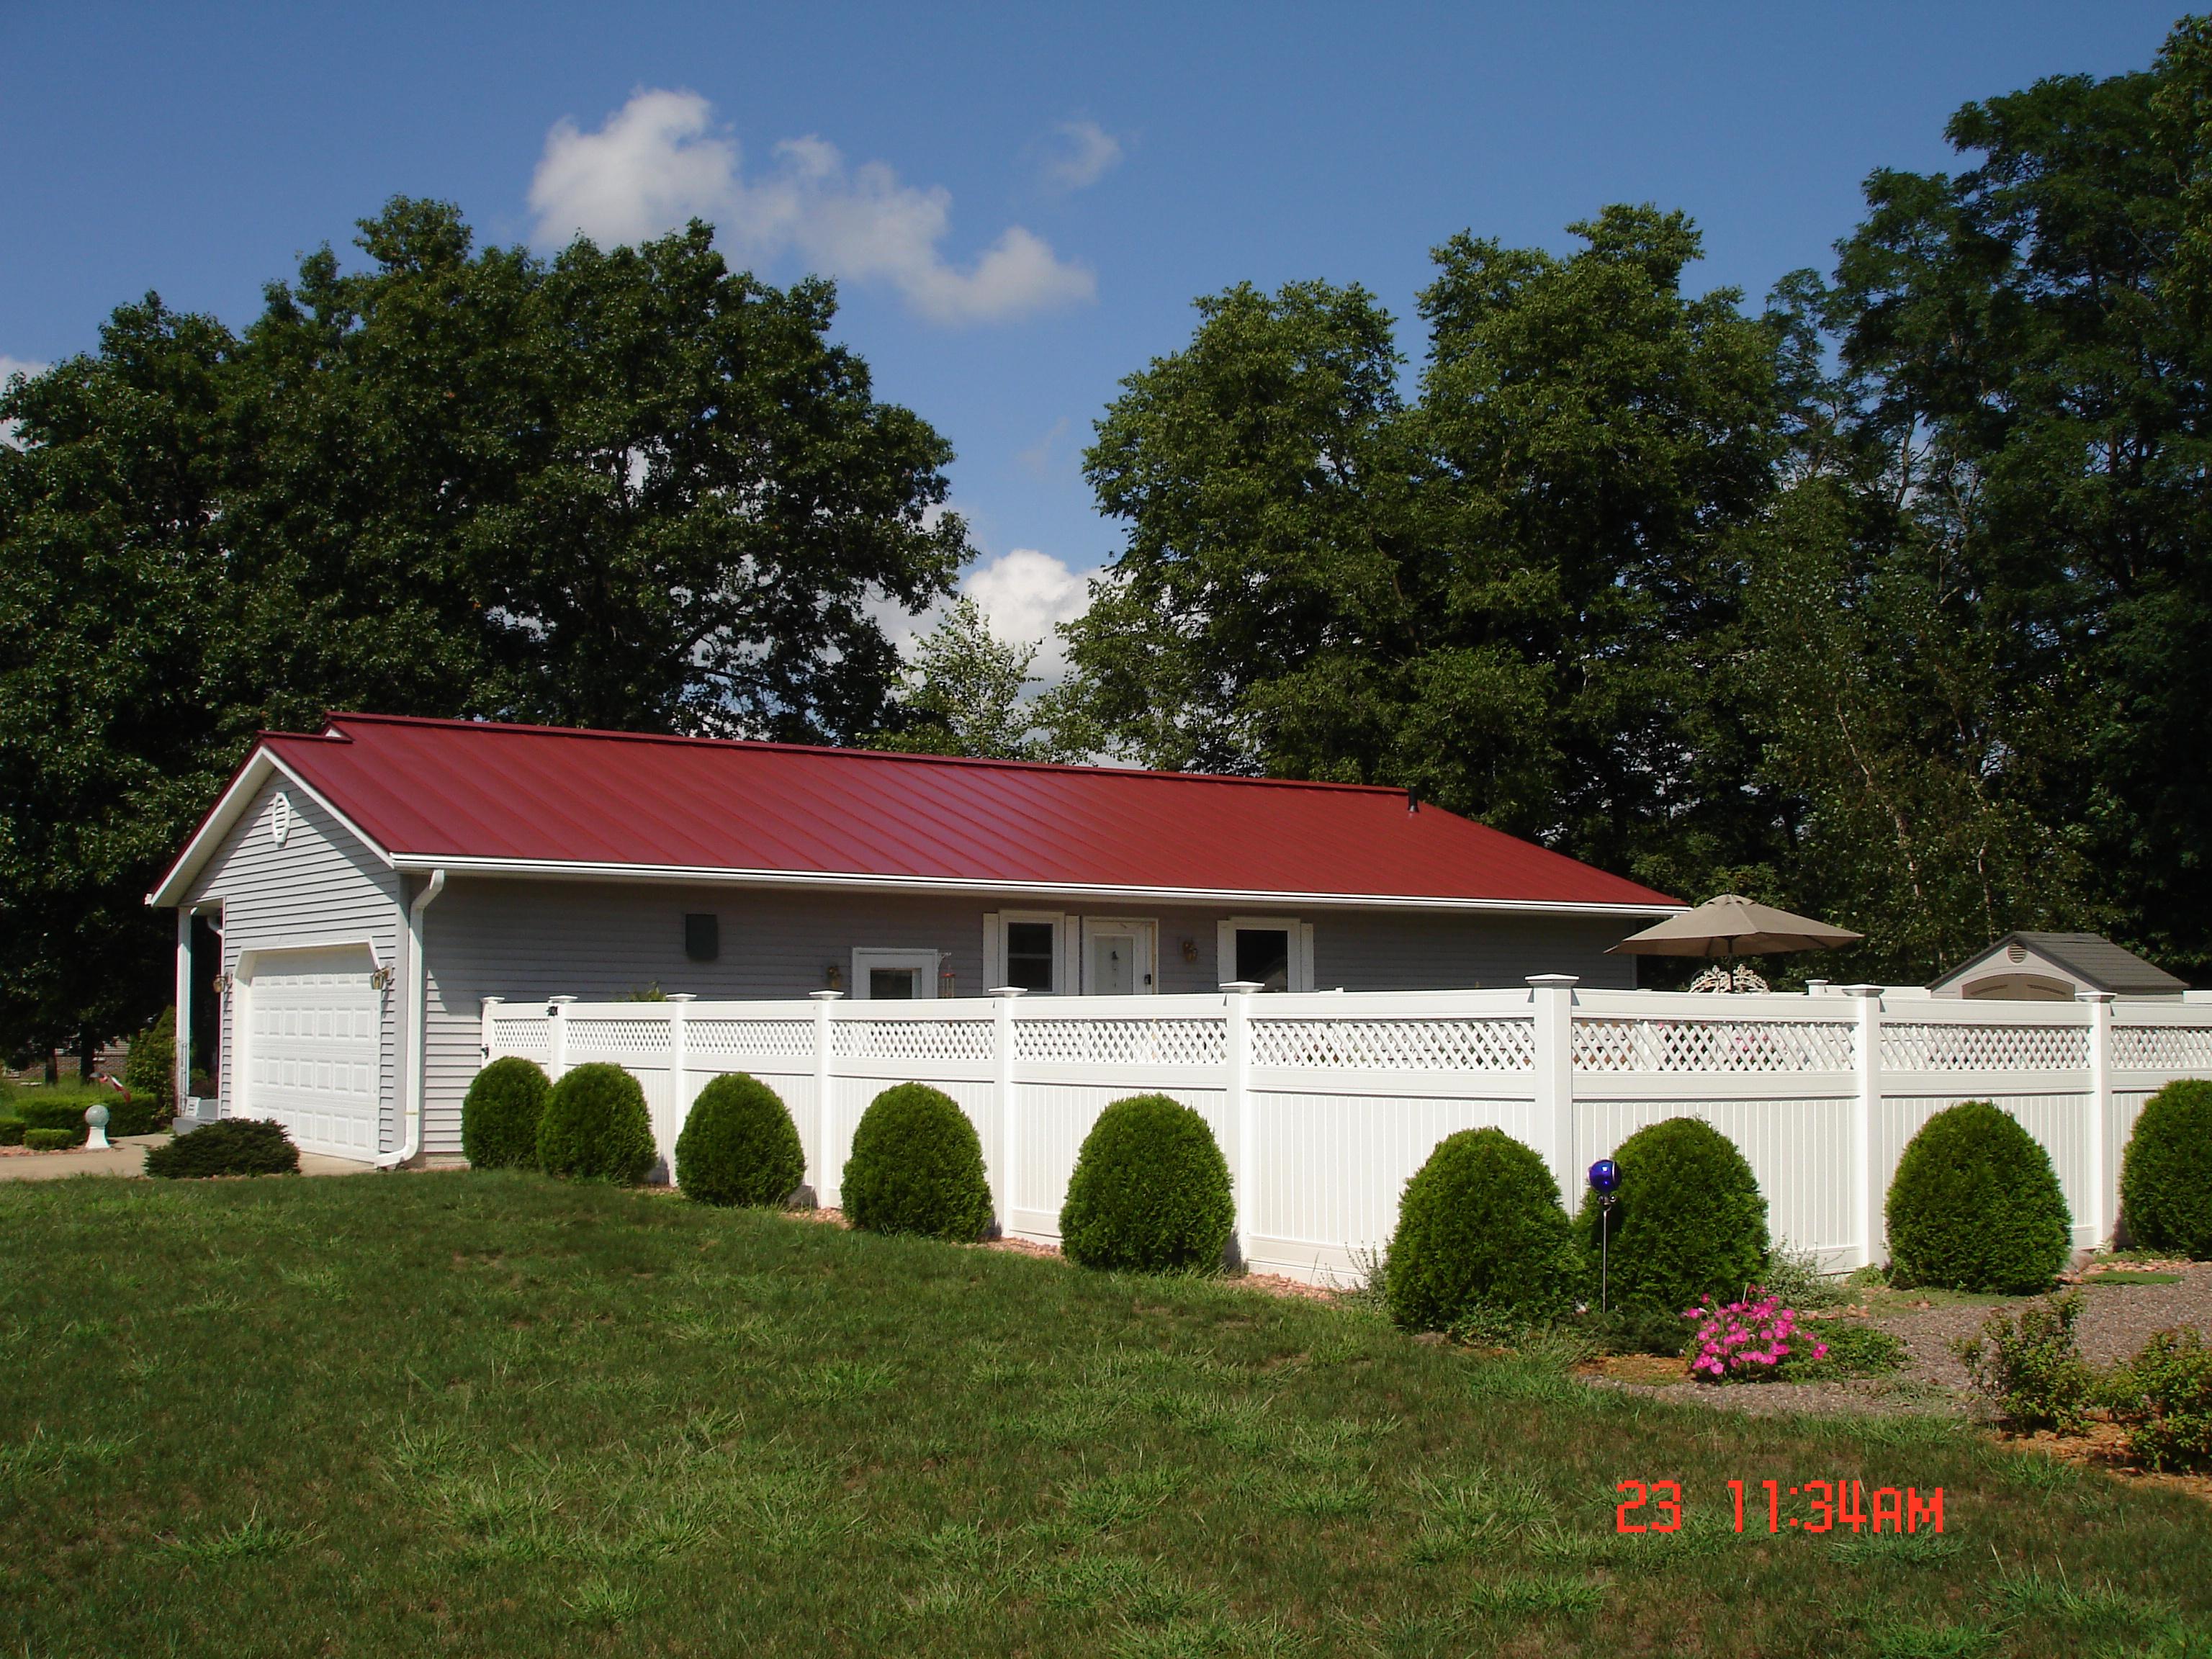 sheet Metal standing seam Roofing red colonial residential house wisconsin iowa illinois minnesota north dakota